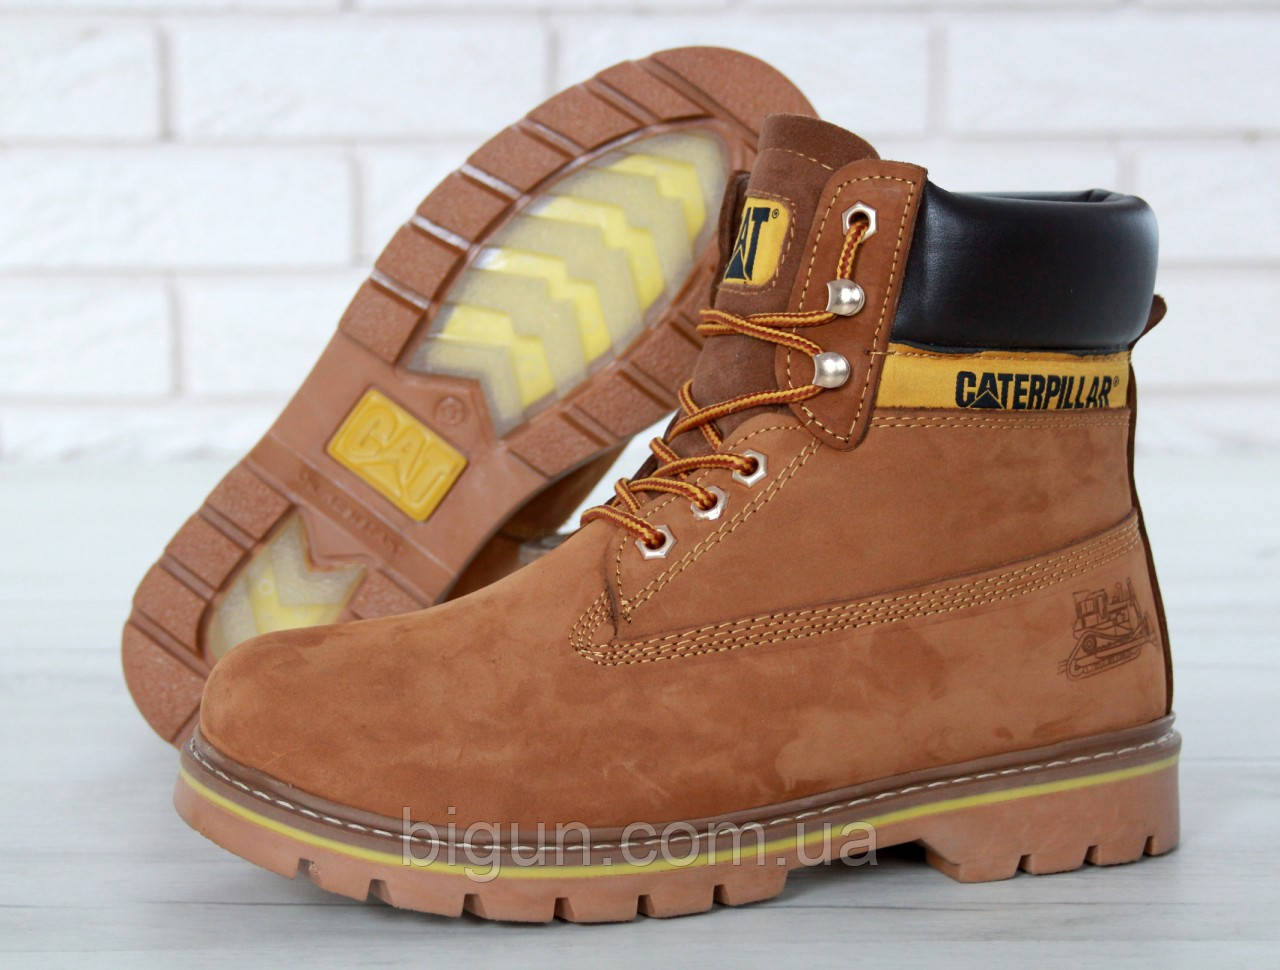 4ed27b888 Женские зимние ботинки Caterpillar (CAT) коричневые, Катерпиллер на меху -